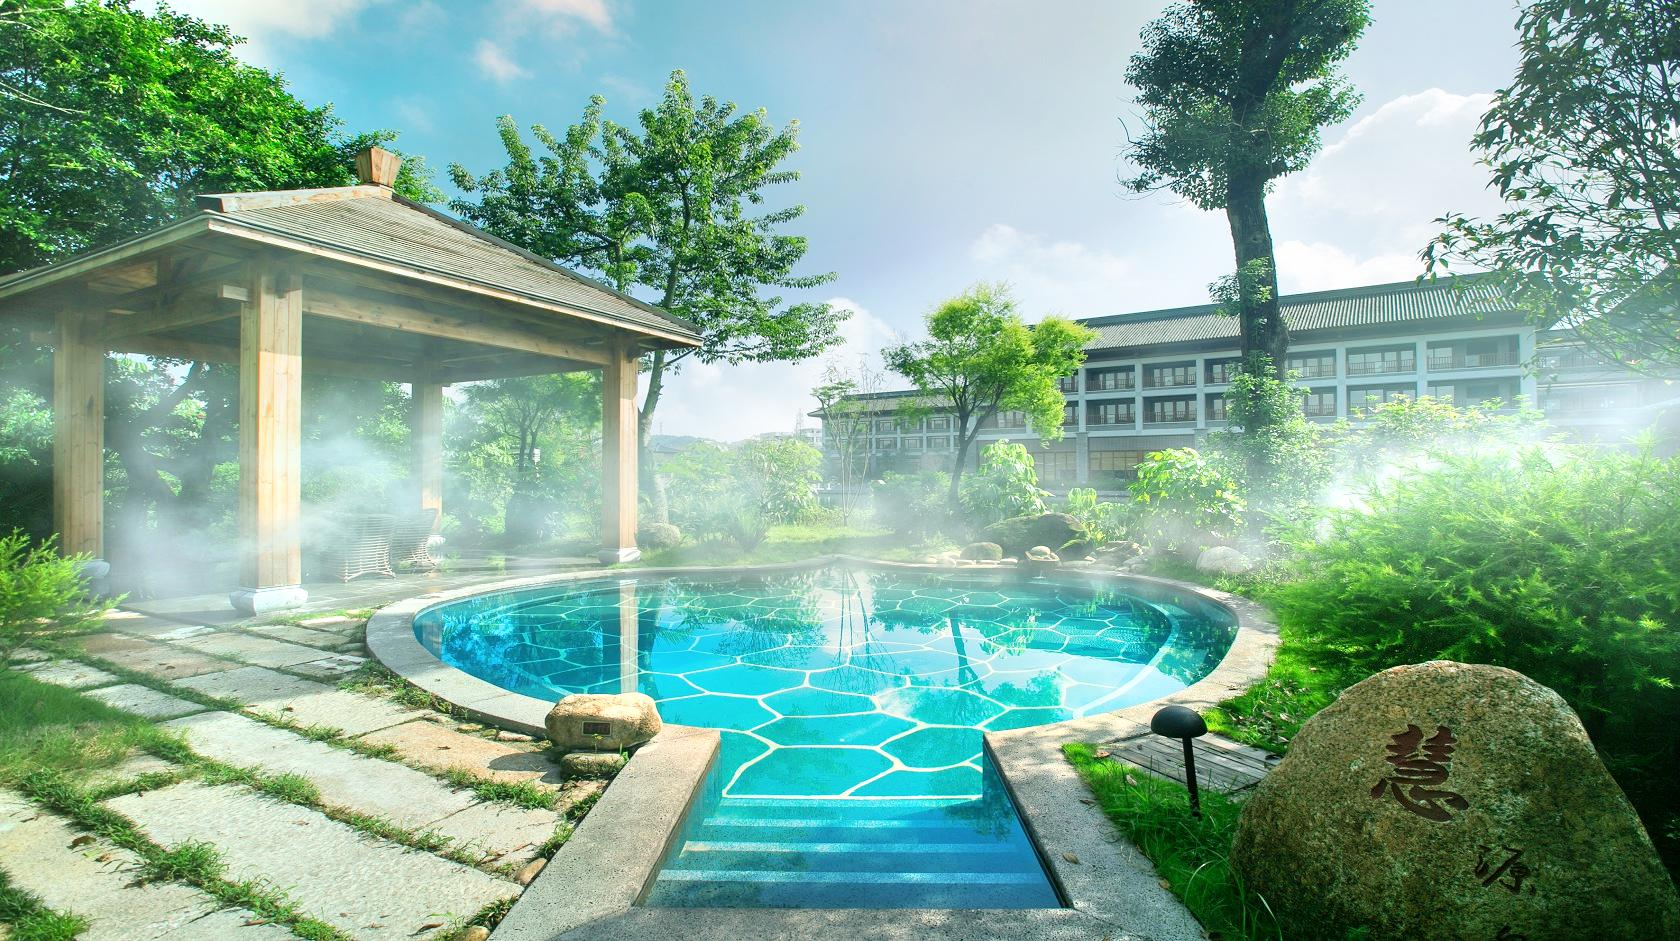 Chanquan Hot Spring